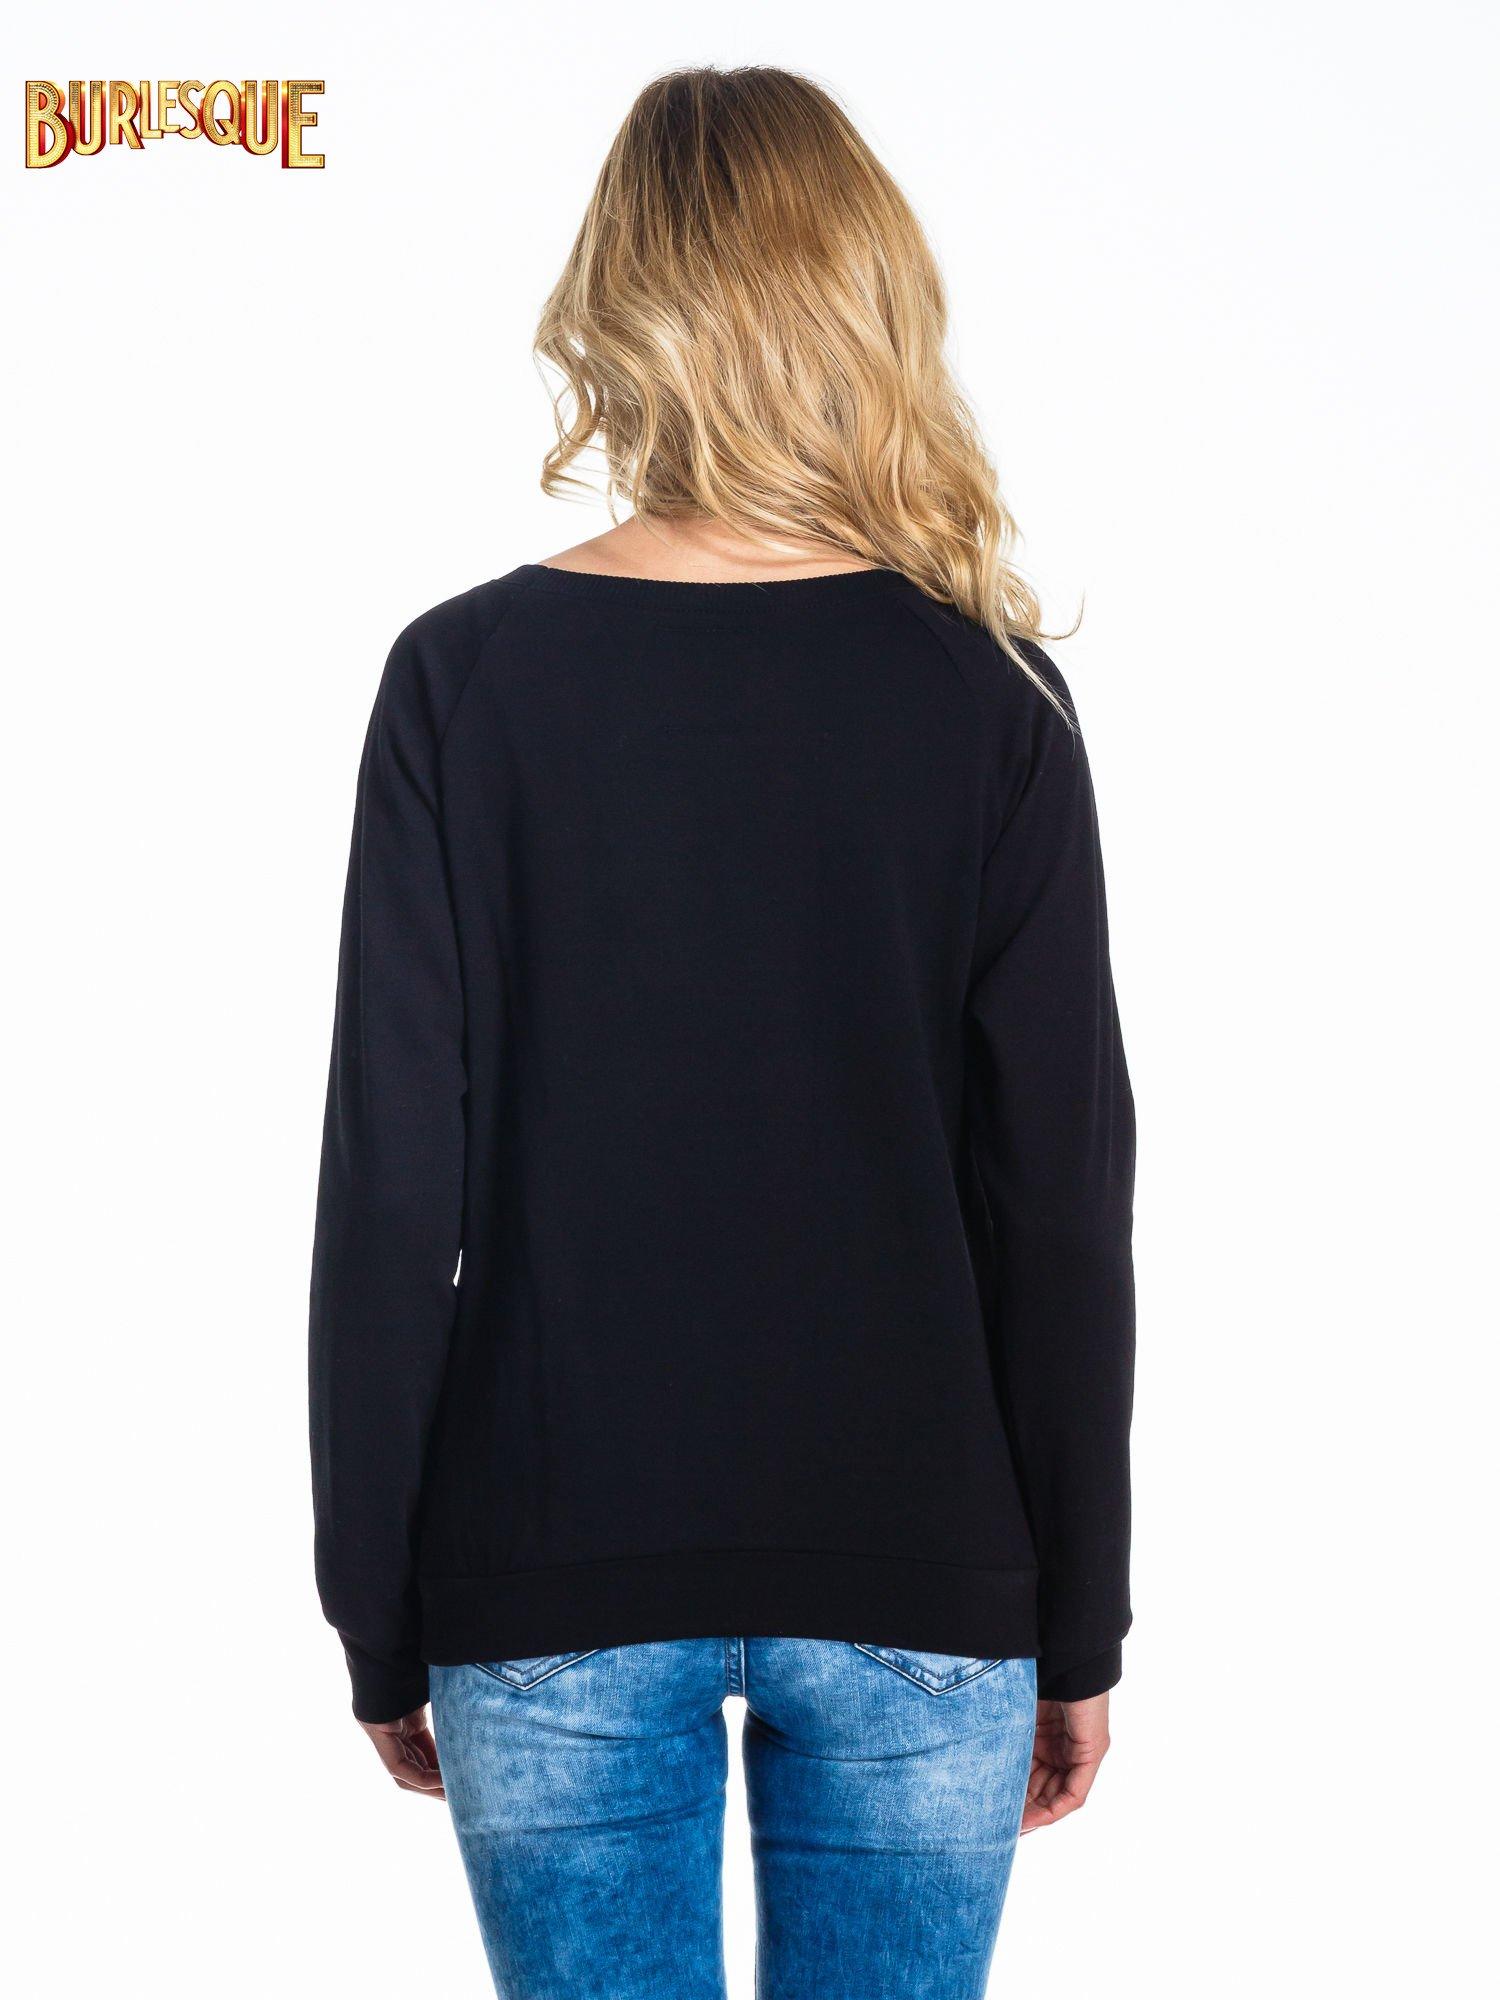 Czarna klasyczna bluza damska z napisem WORK OUT                                  zdj.                                  2